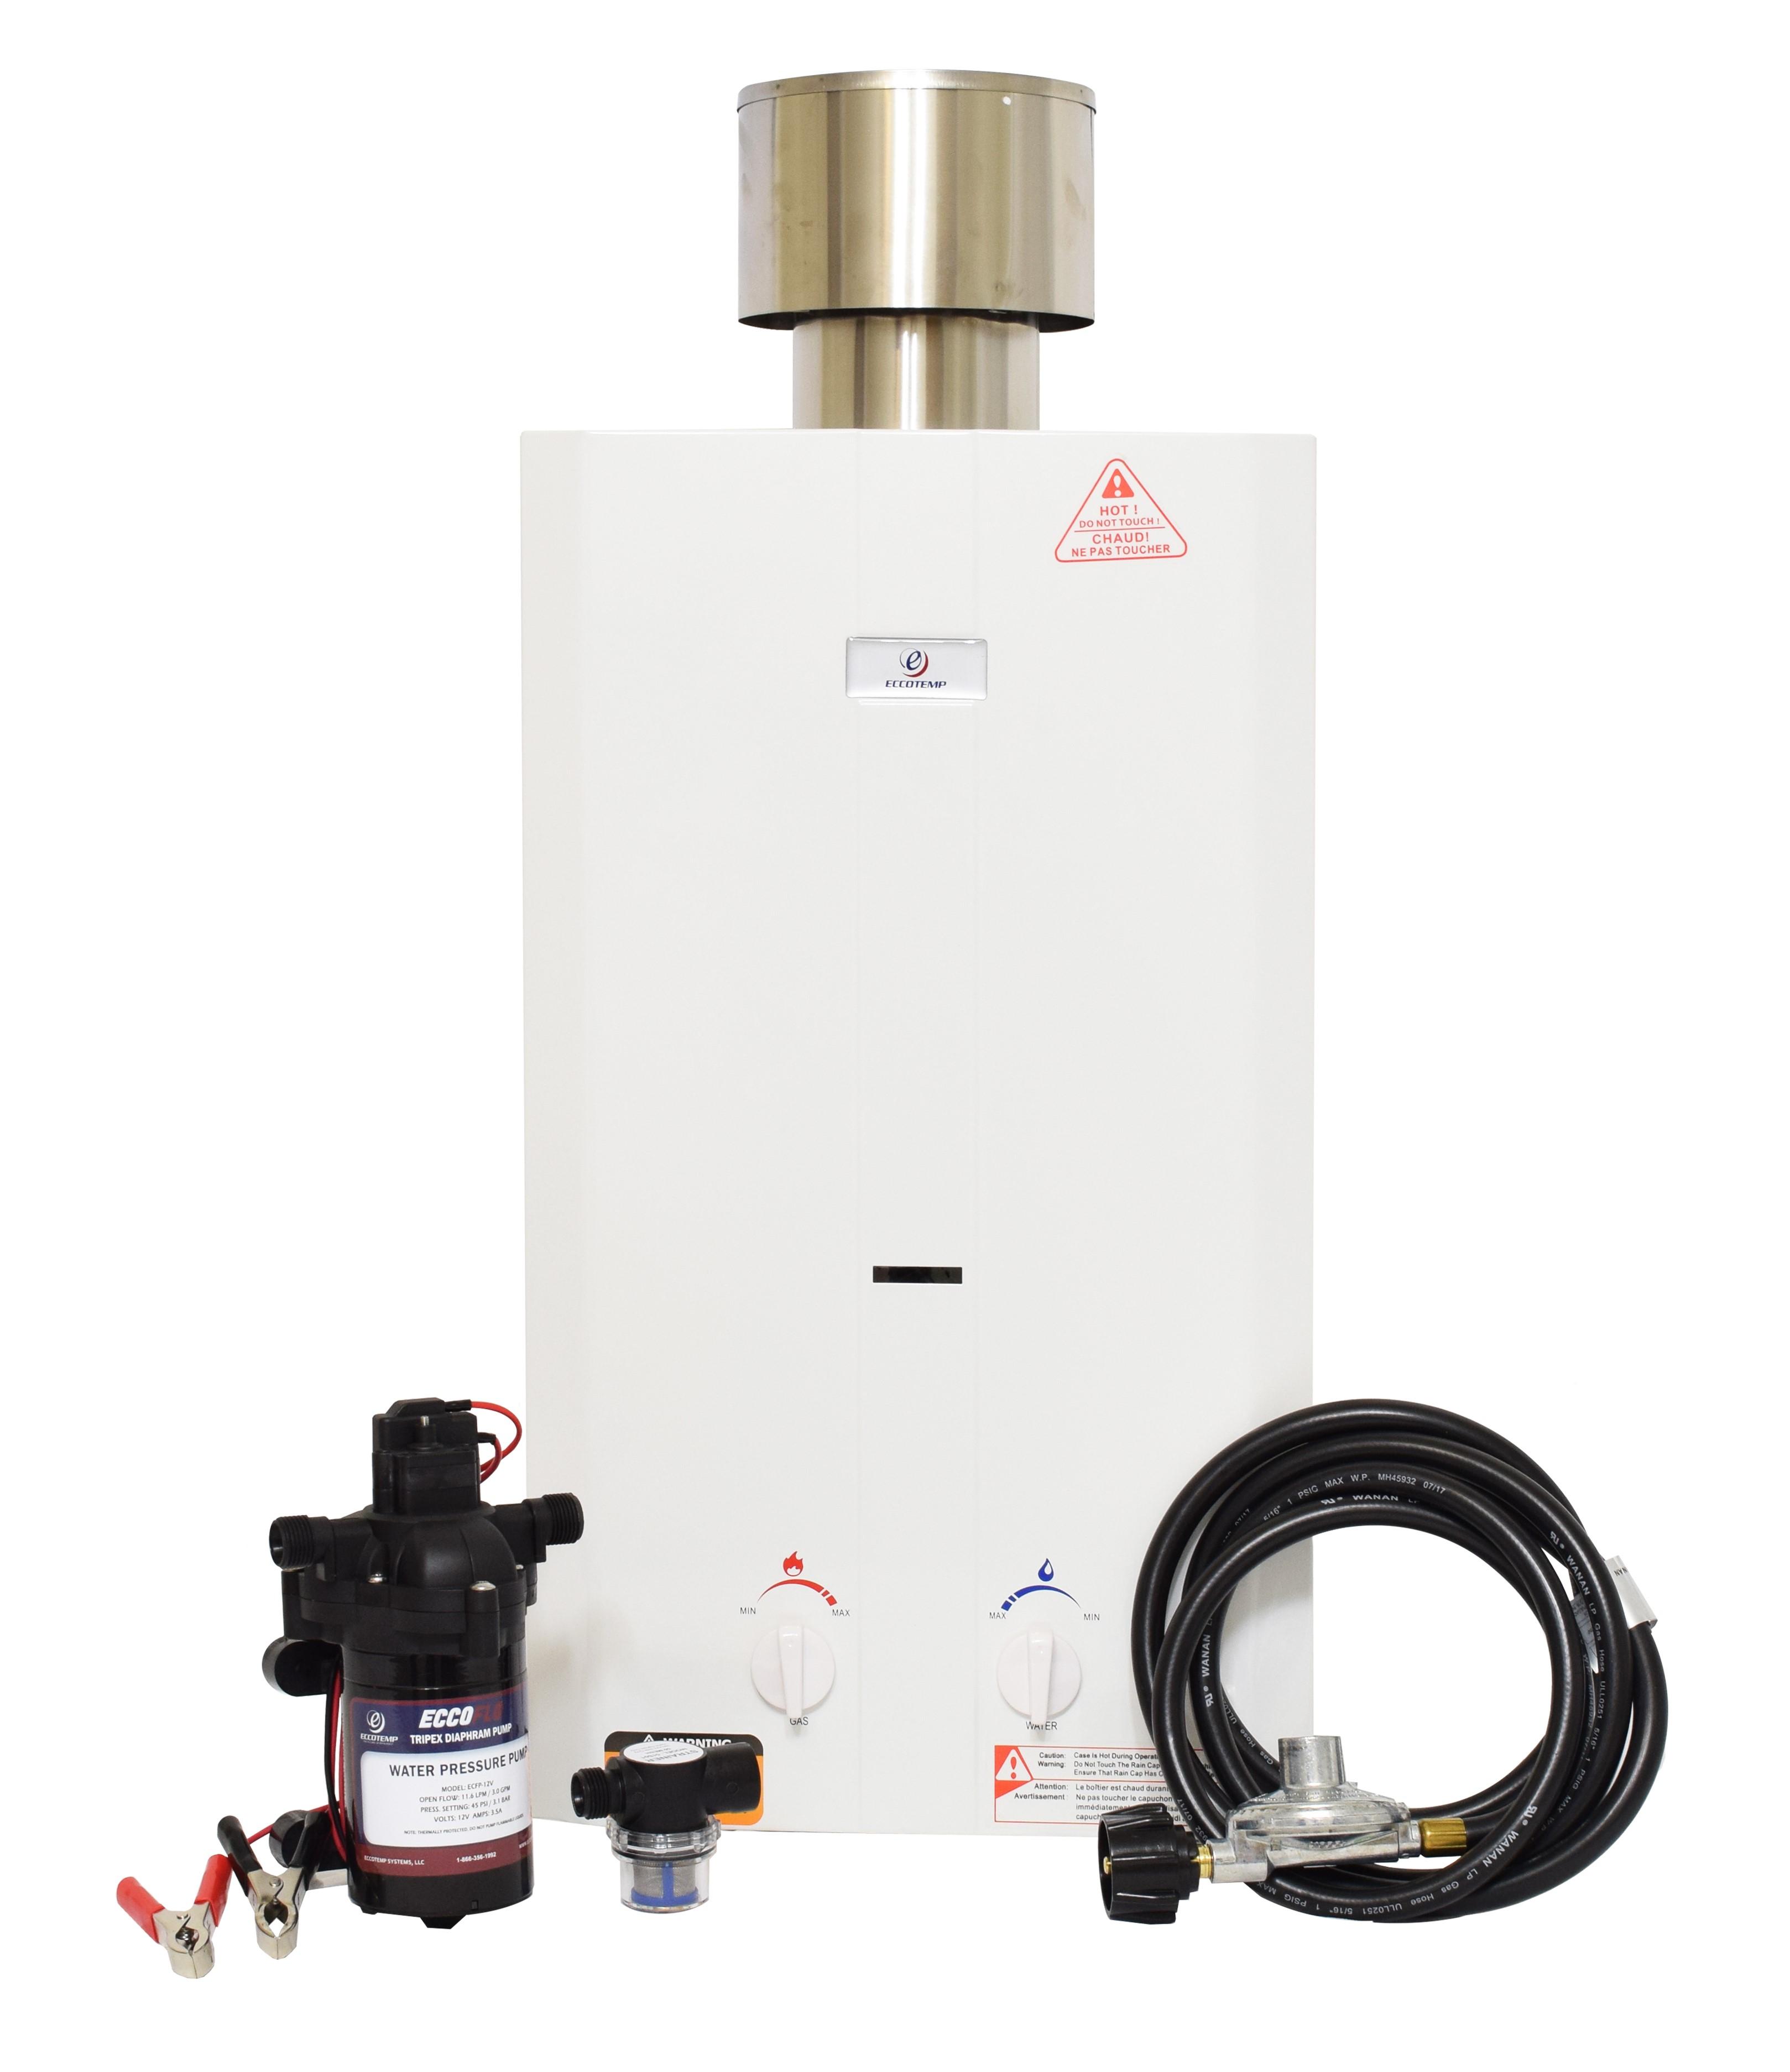 Eccotemp L10 Portable Outdoor Water Heater w/ EccoFlo Diaphragm 12V Pump & Strainer